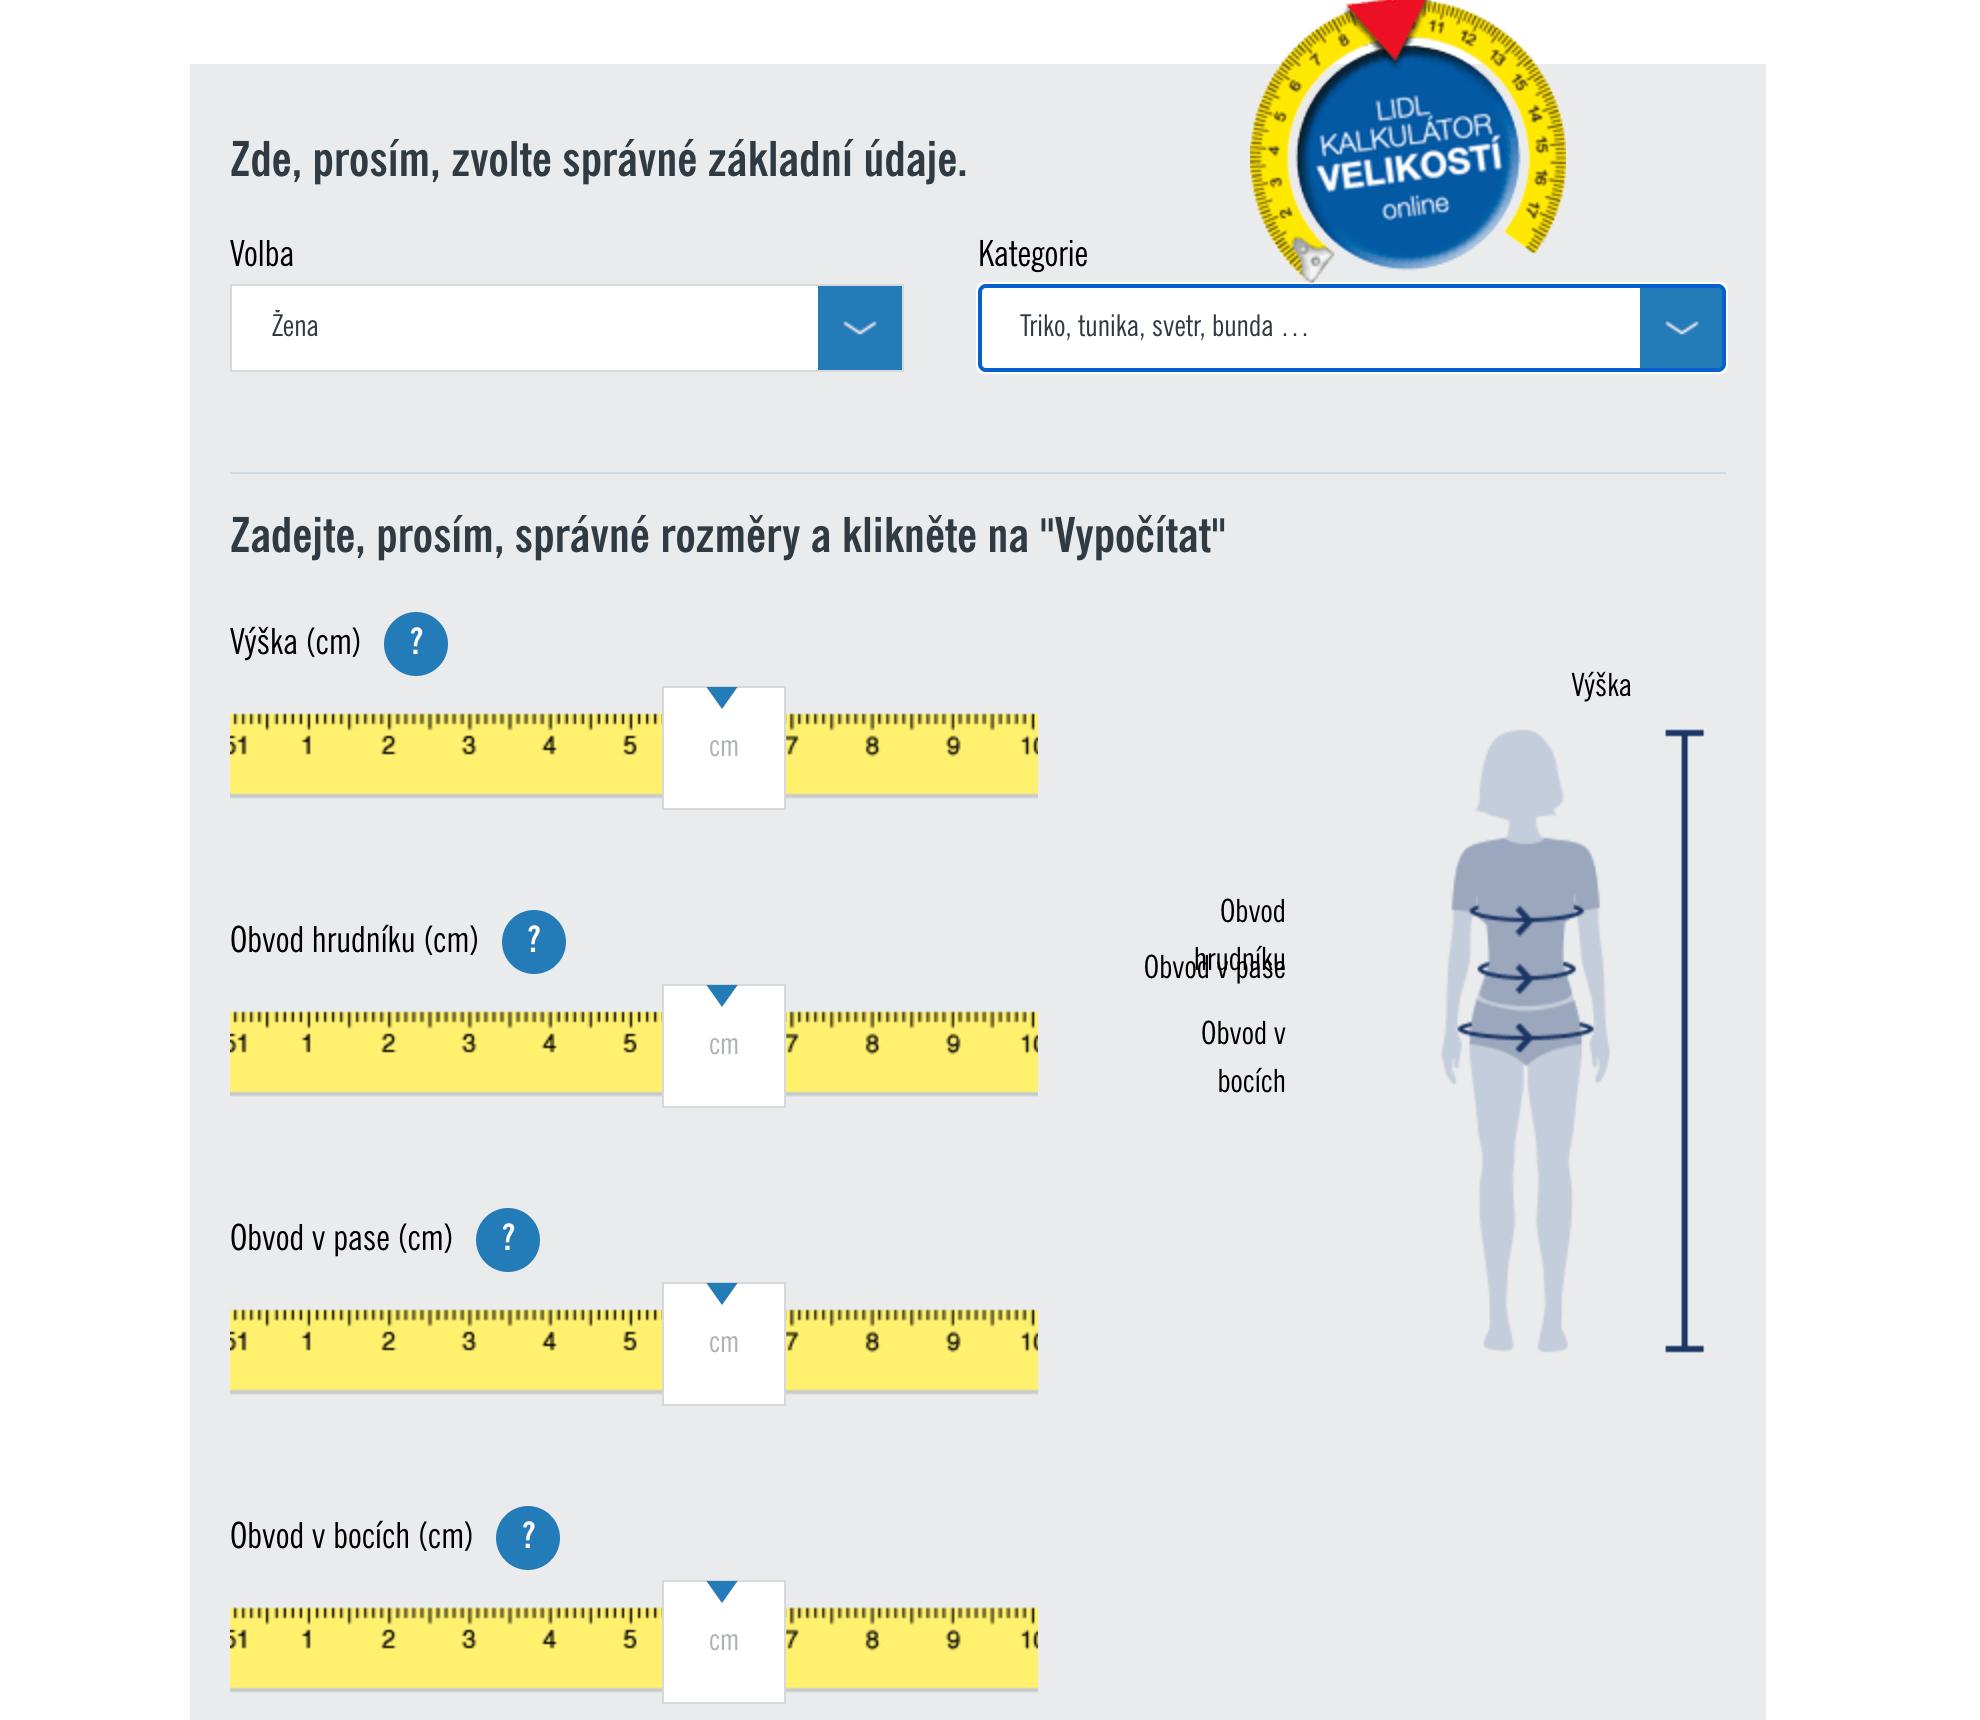 Kalkurátor velikostí Lidl.cz